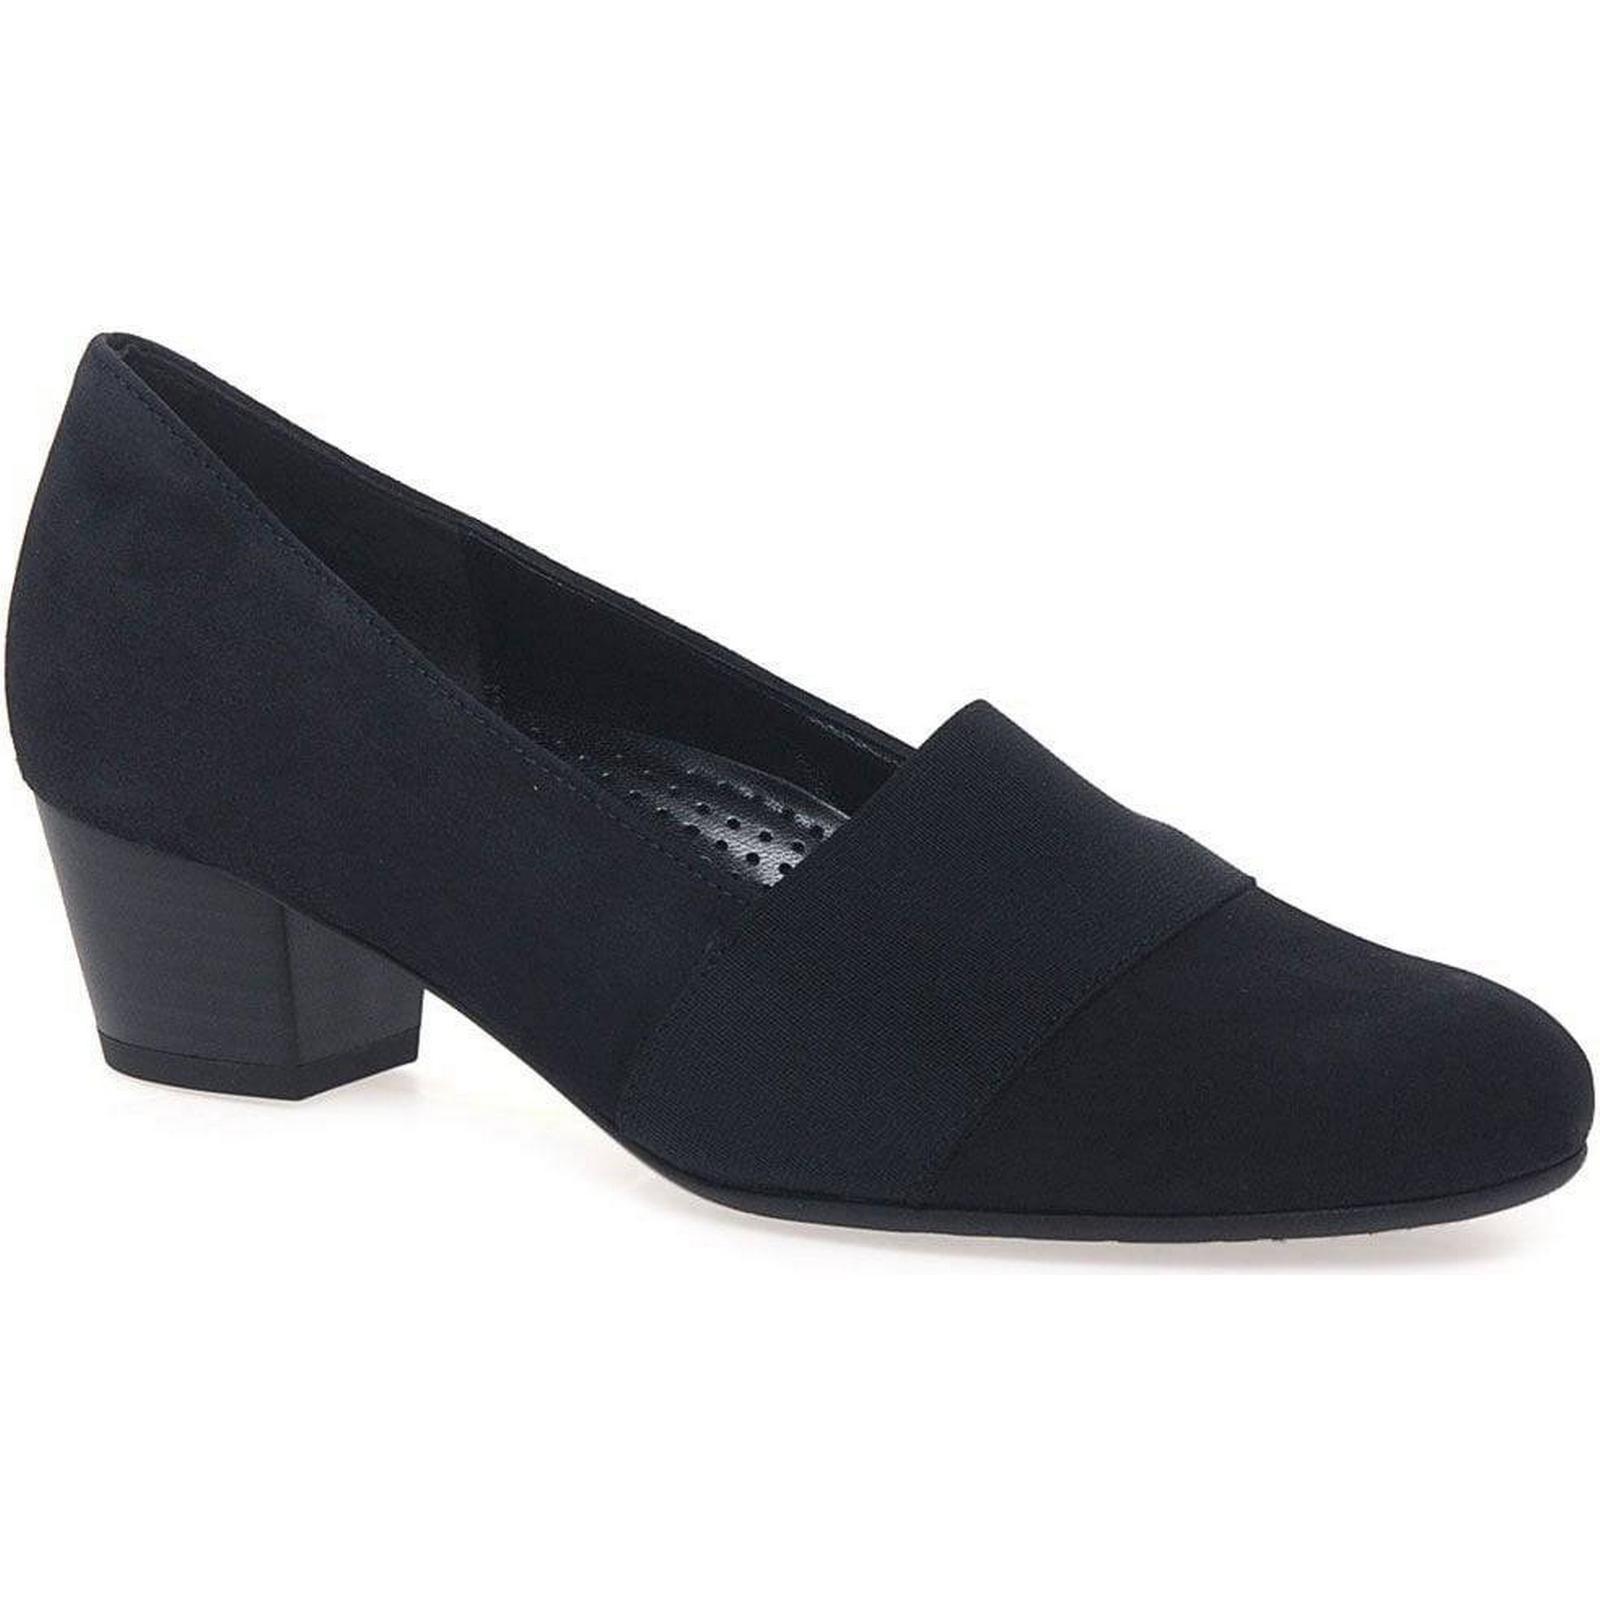 Gabor Sovereign Womens Court Shoes 6 Colour: Pacific Suede, Size: 6 Shoes 530f5b